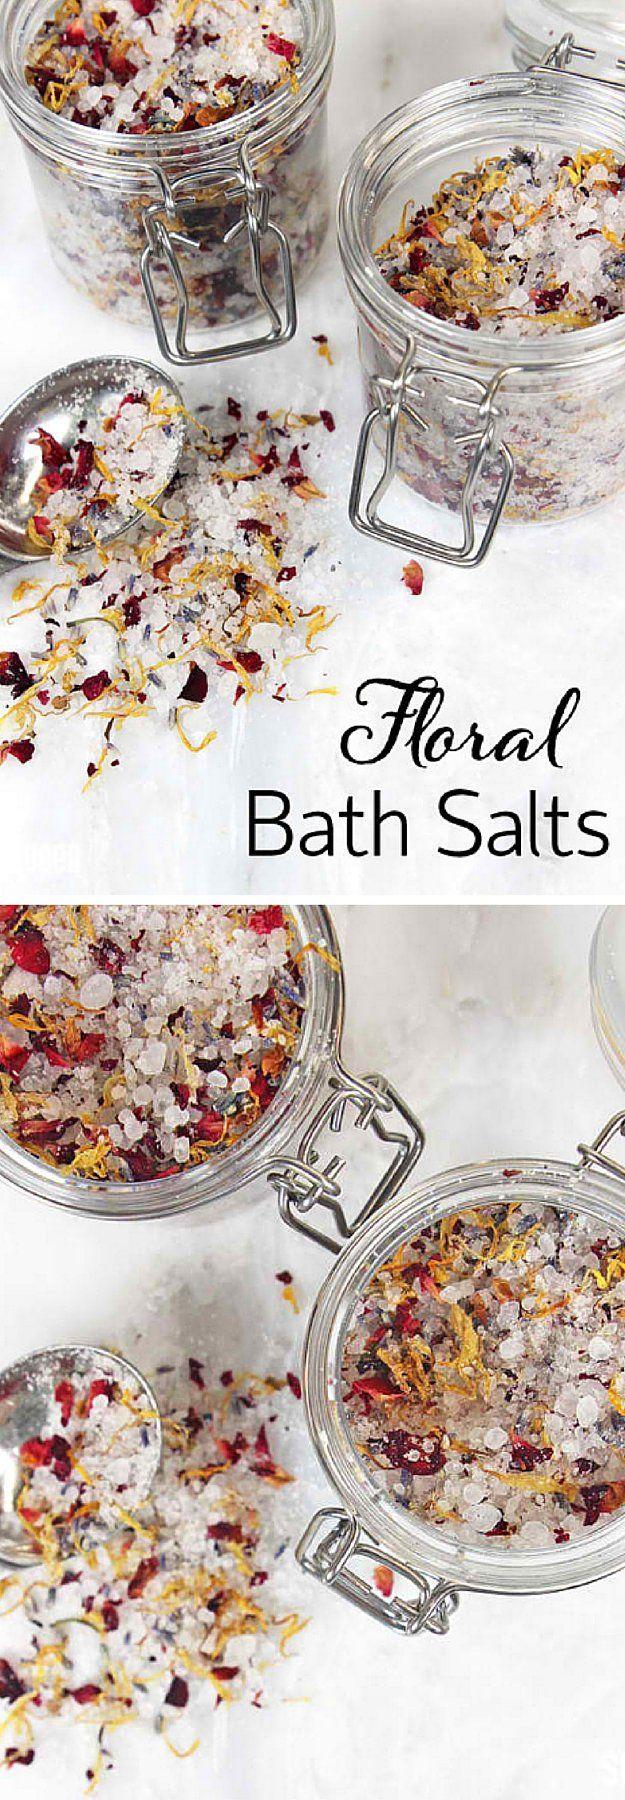 Floral Bath Salts | 17 DIY Bath Salts | Learn How To Make The Most Relaxing Bath...